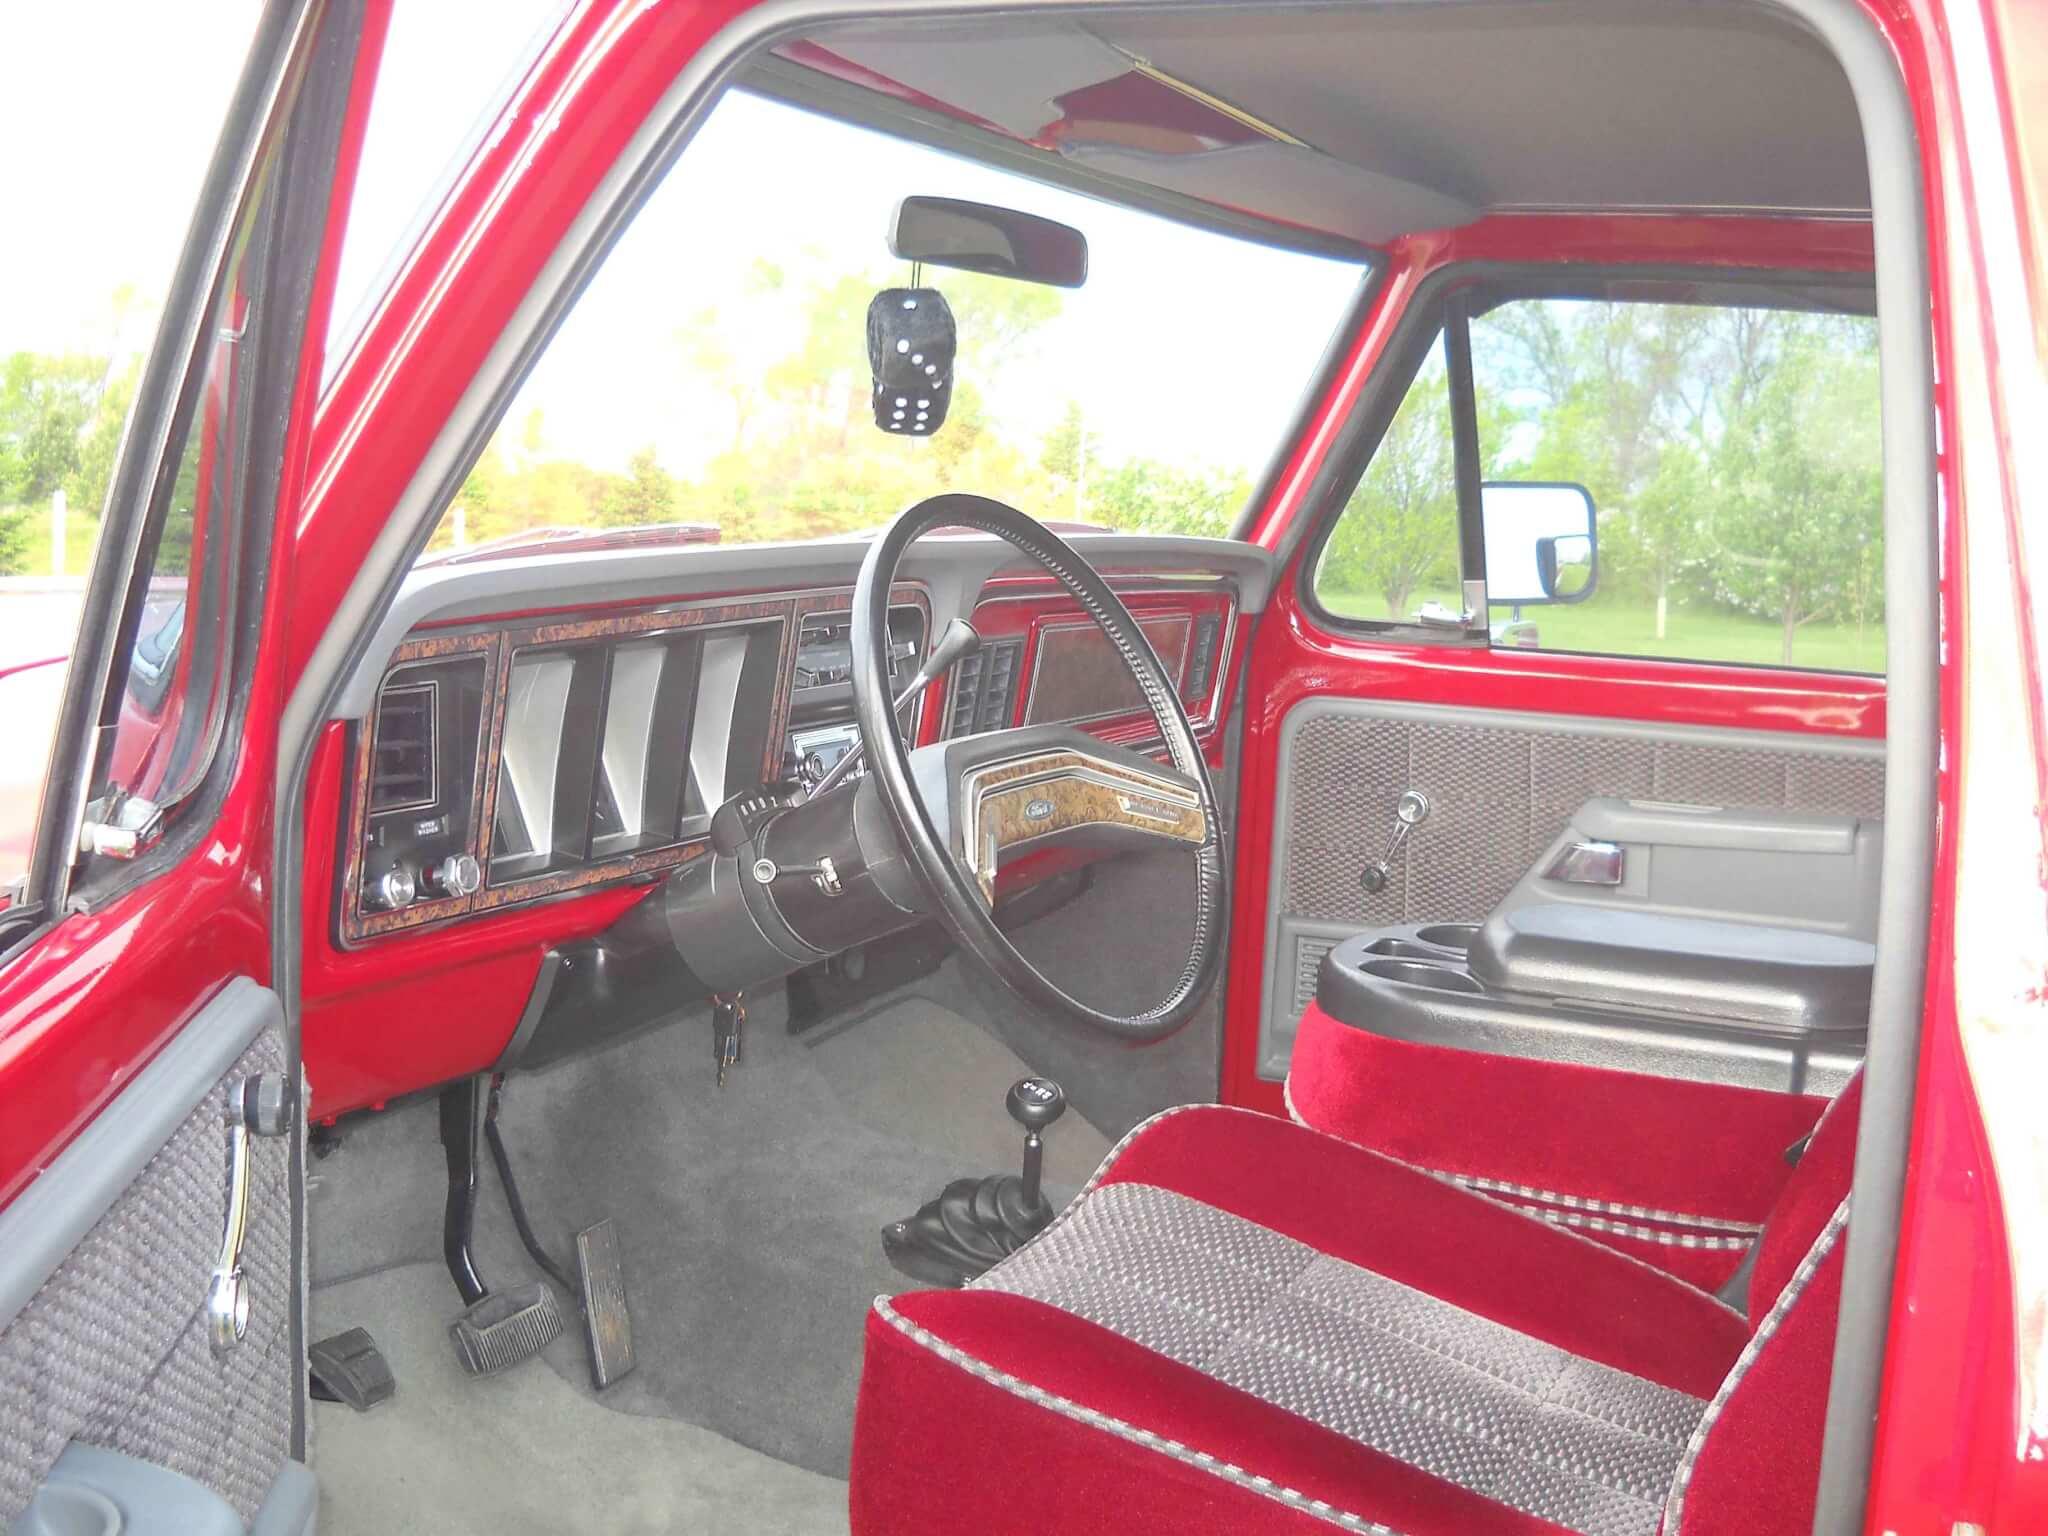 1979 Ford Bronco - Wayne Zimny - LMC Truck Life